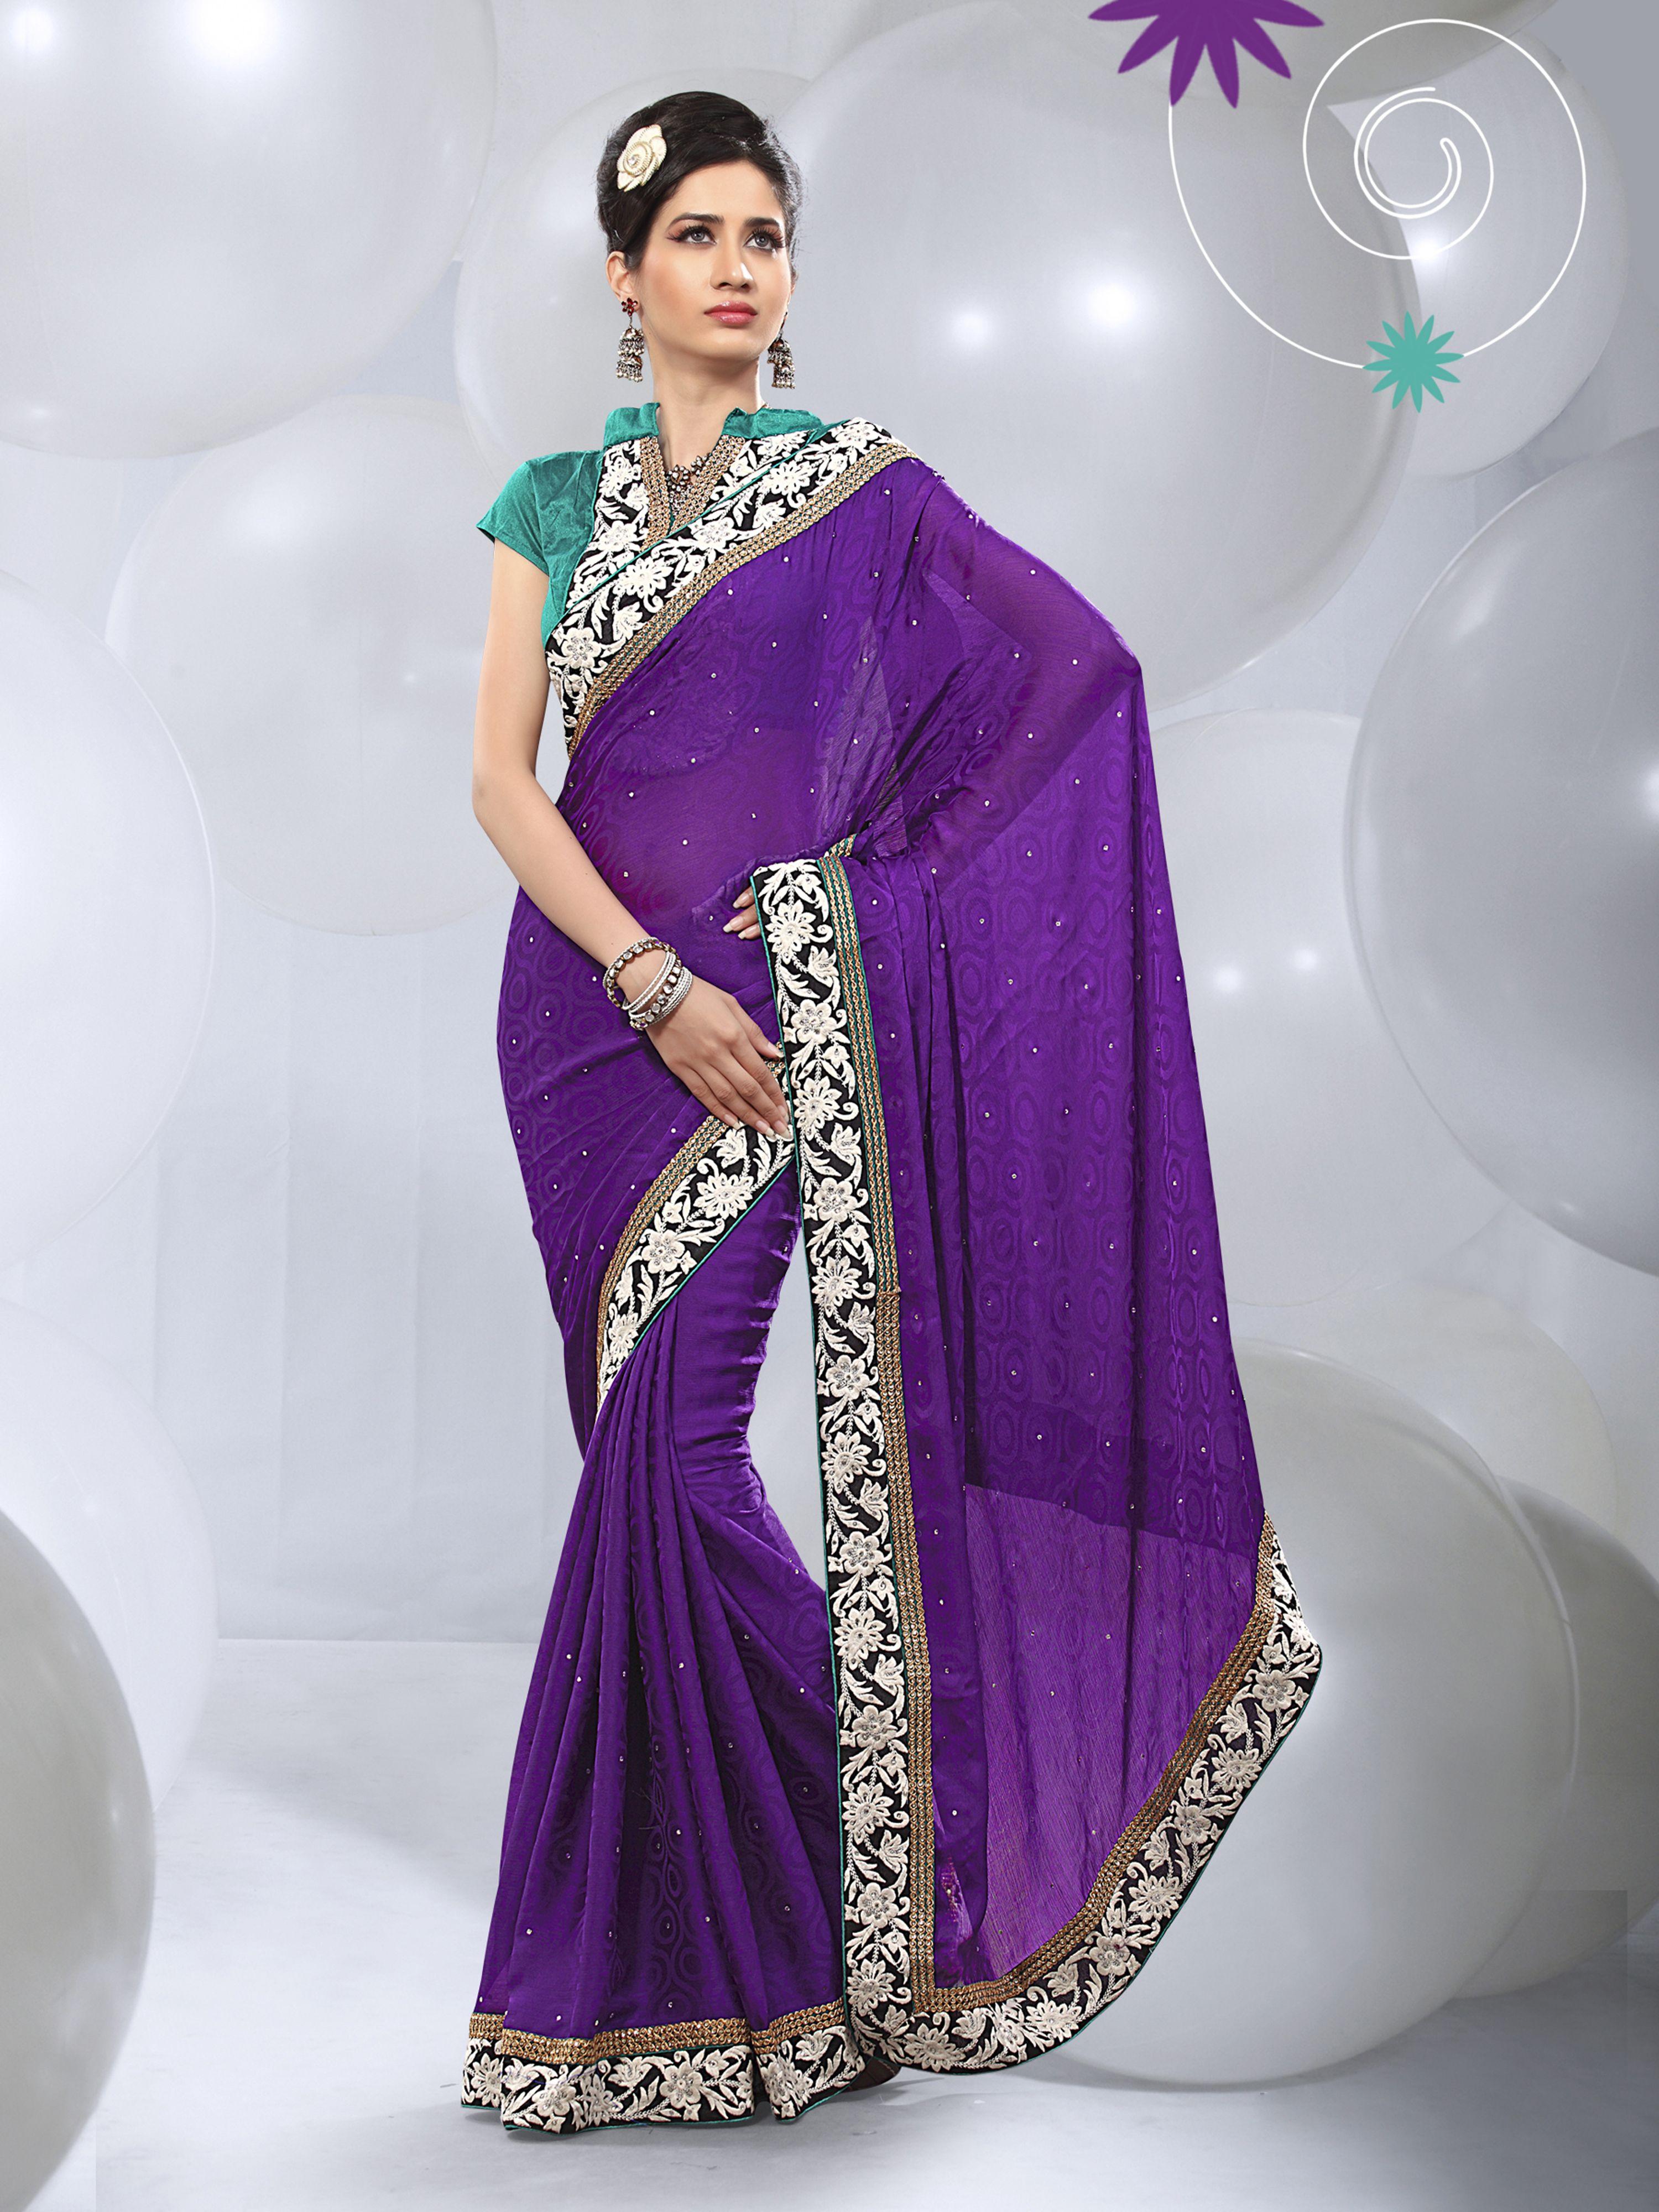 Sari wedding dress  Purple Designer Plain Sari USA For More Saree Check this page now